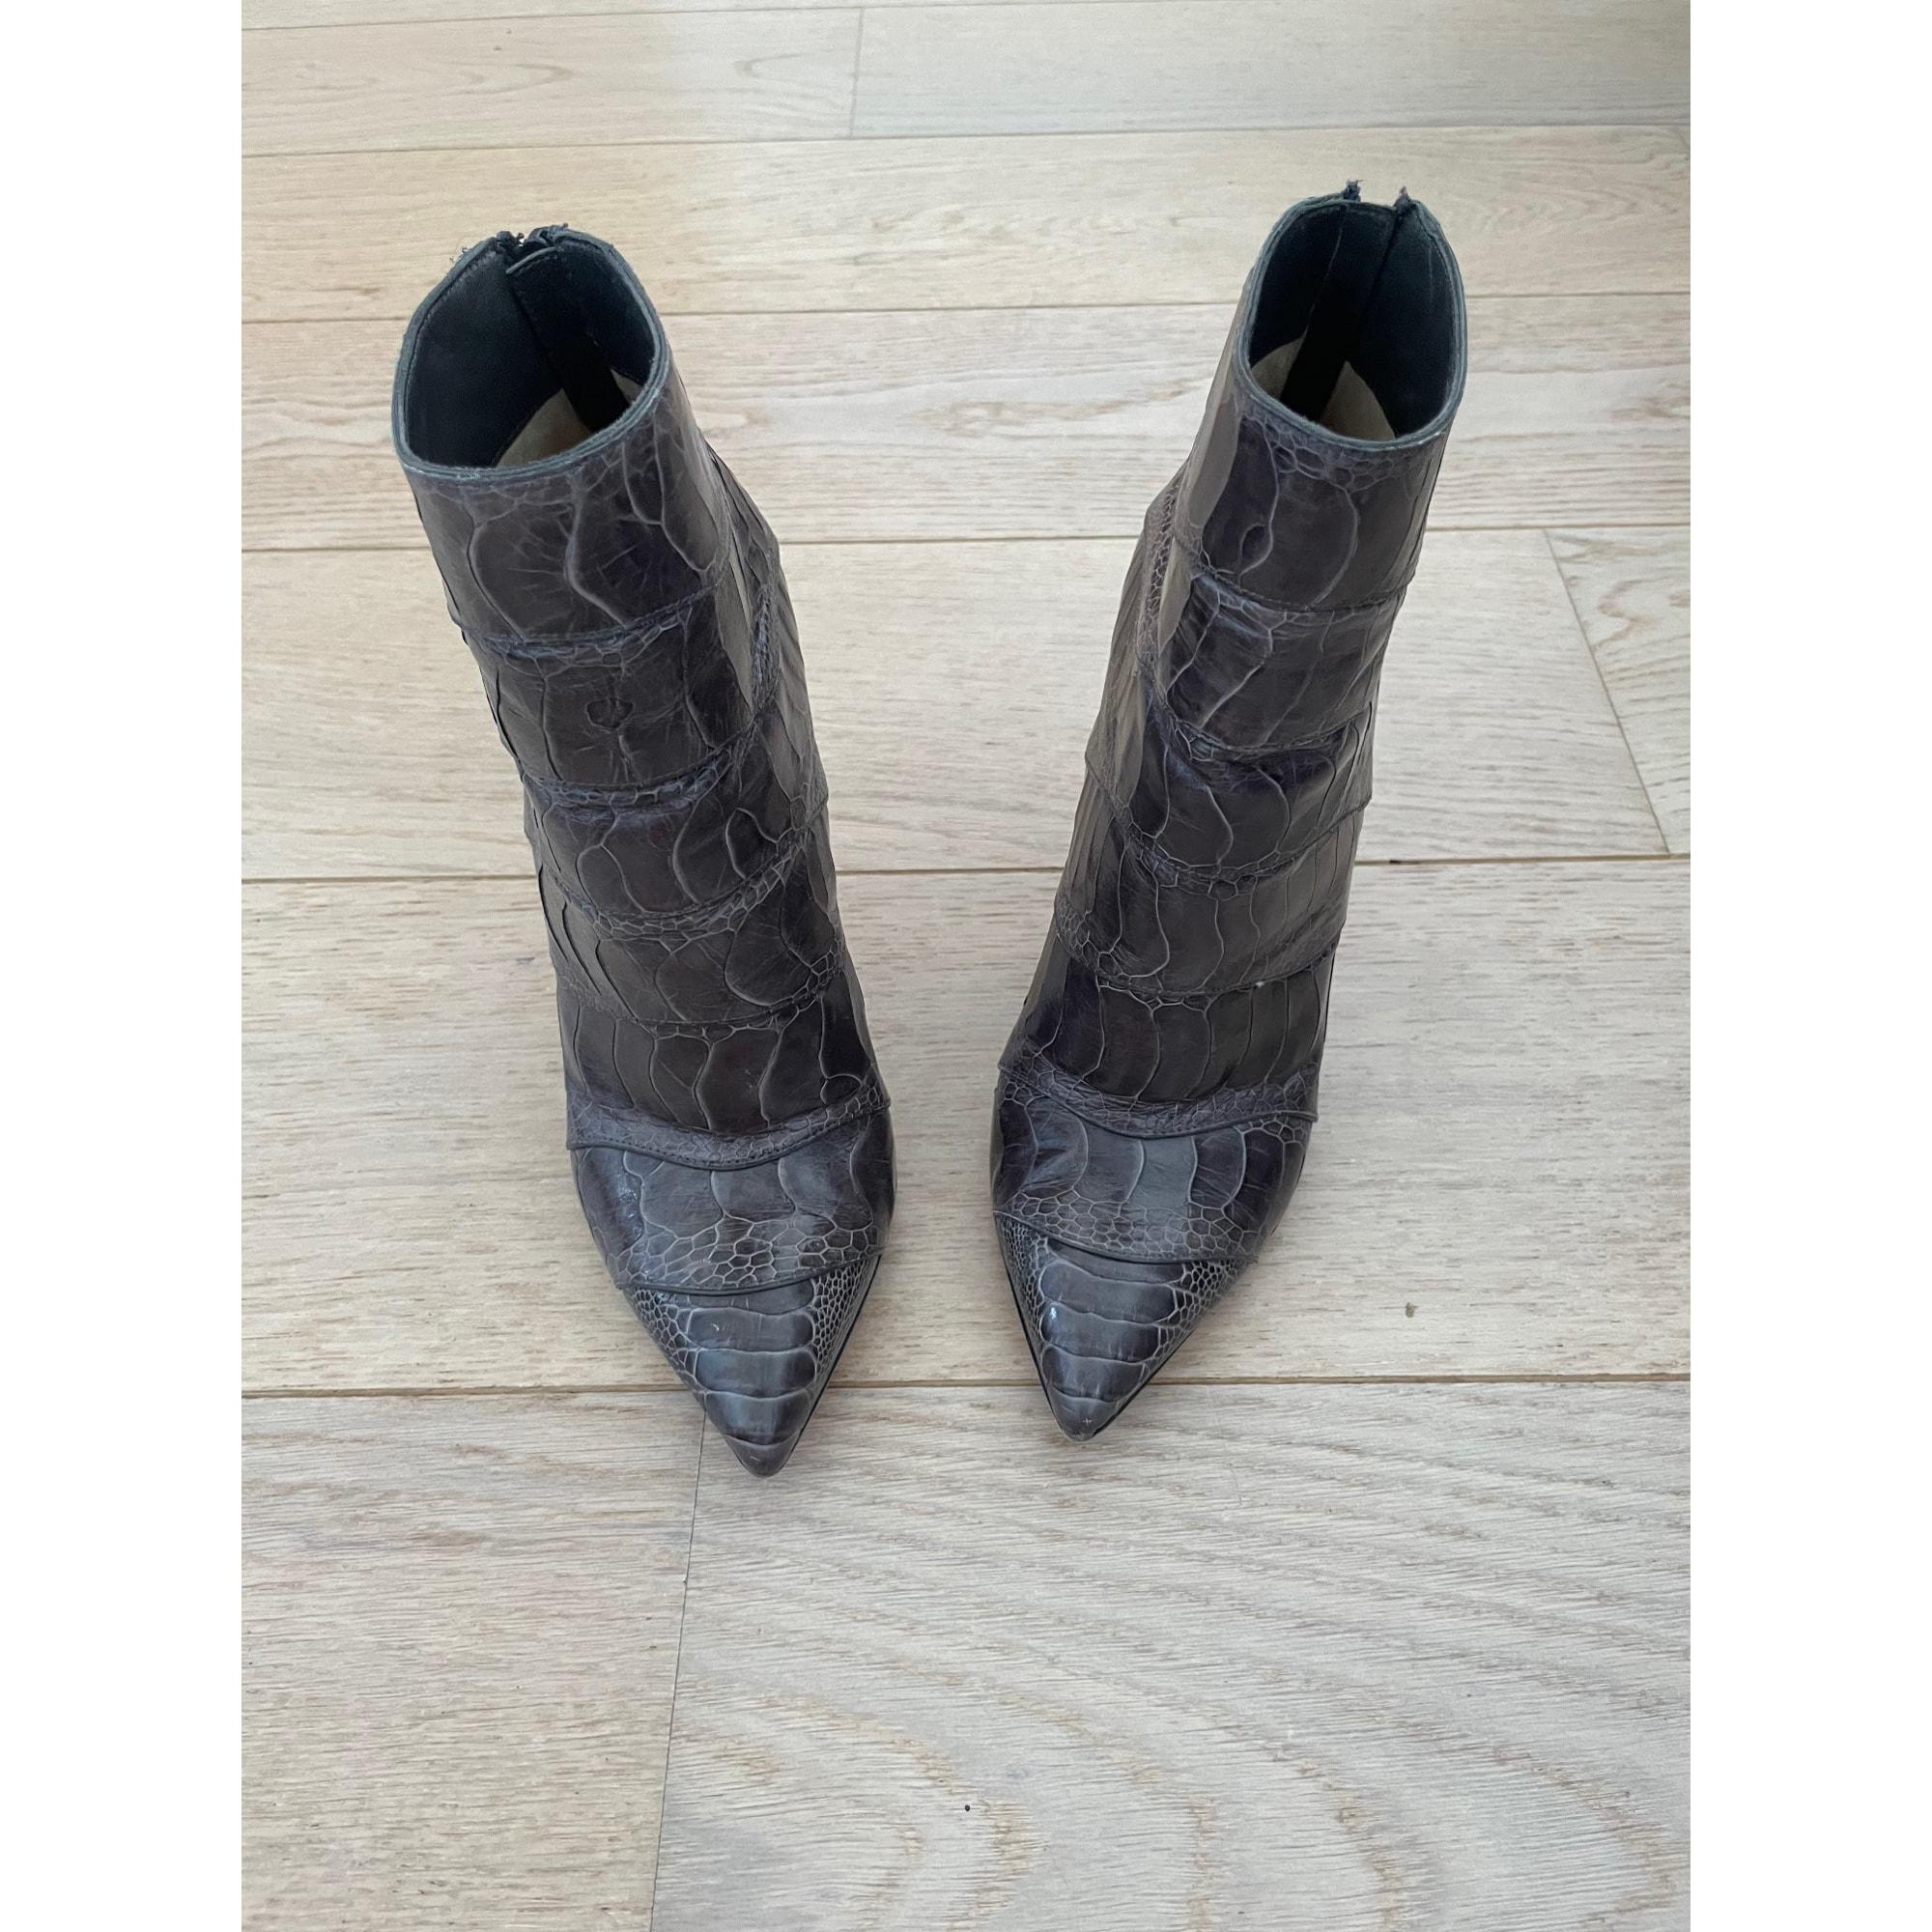 Bottines & low boots à talons CHRISTIAN LOUBOUTIN Gris, anthracite